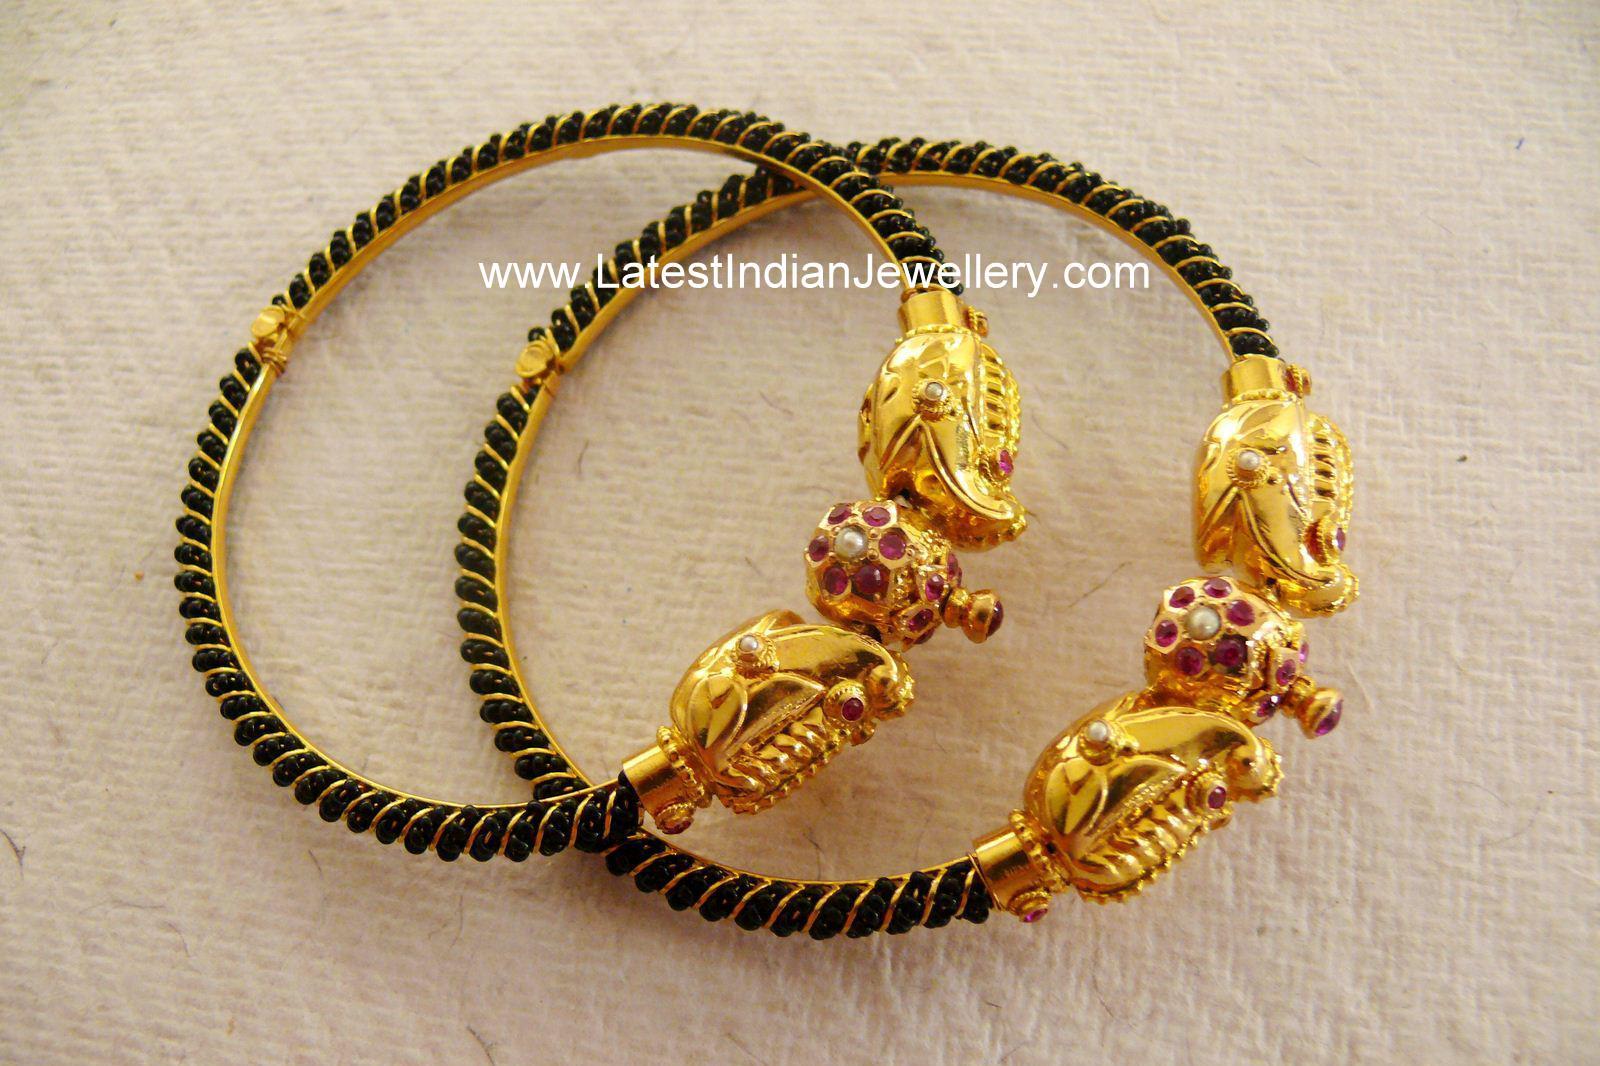 Cute Antique Baby Bangles Murugulu With Black Beads